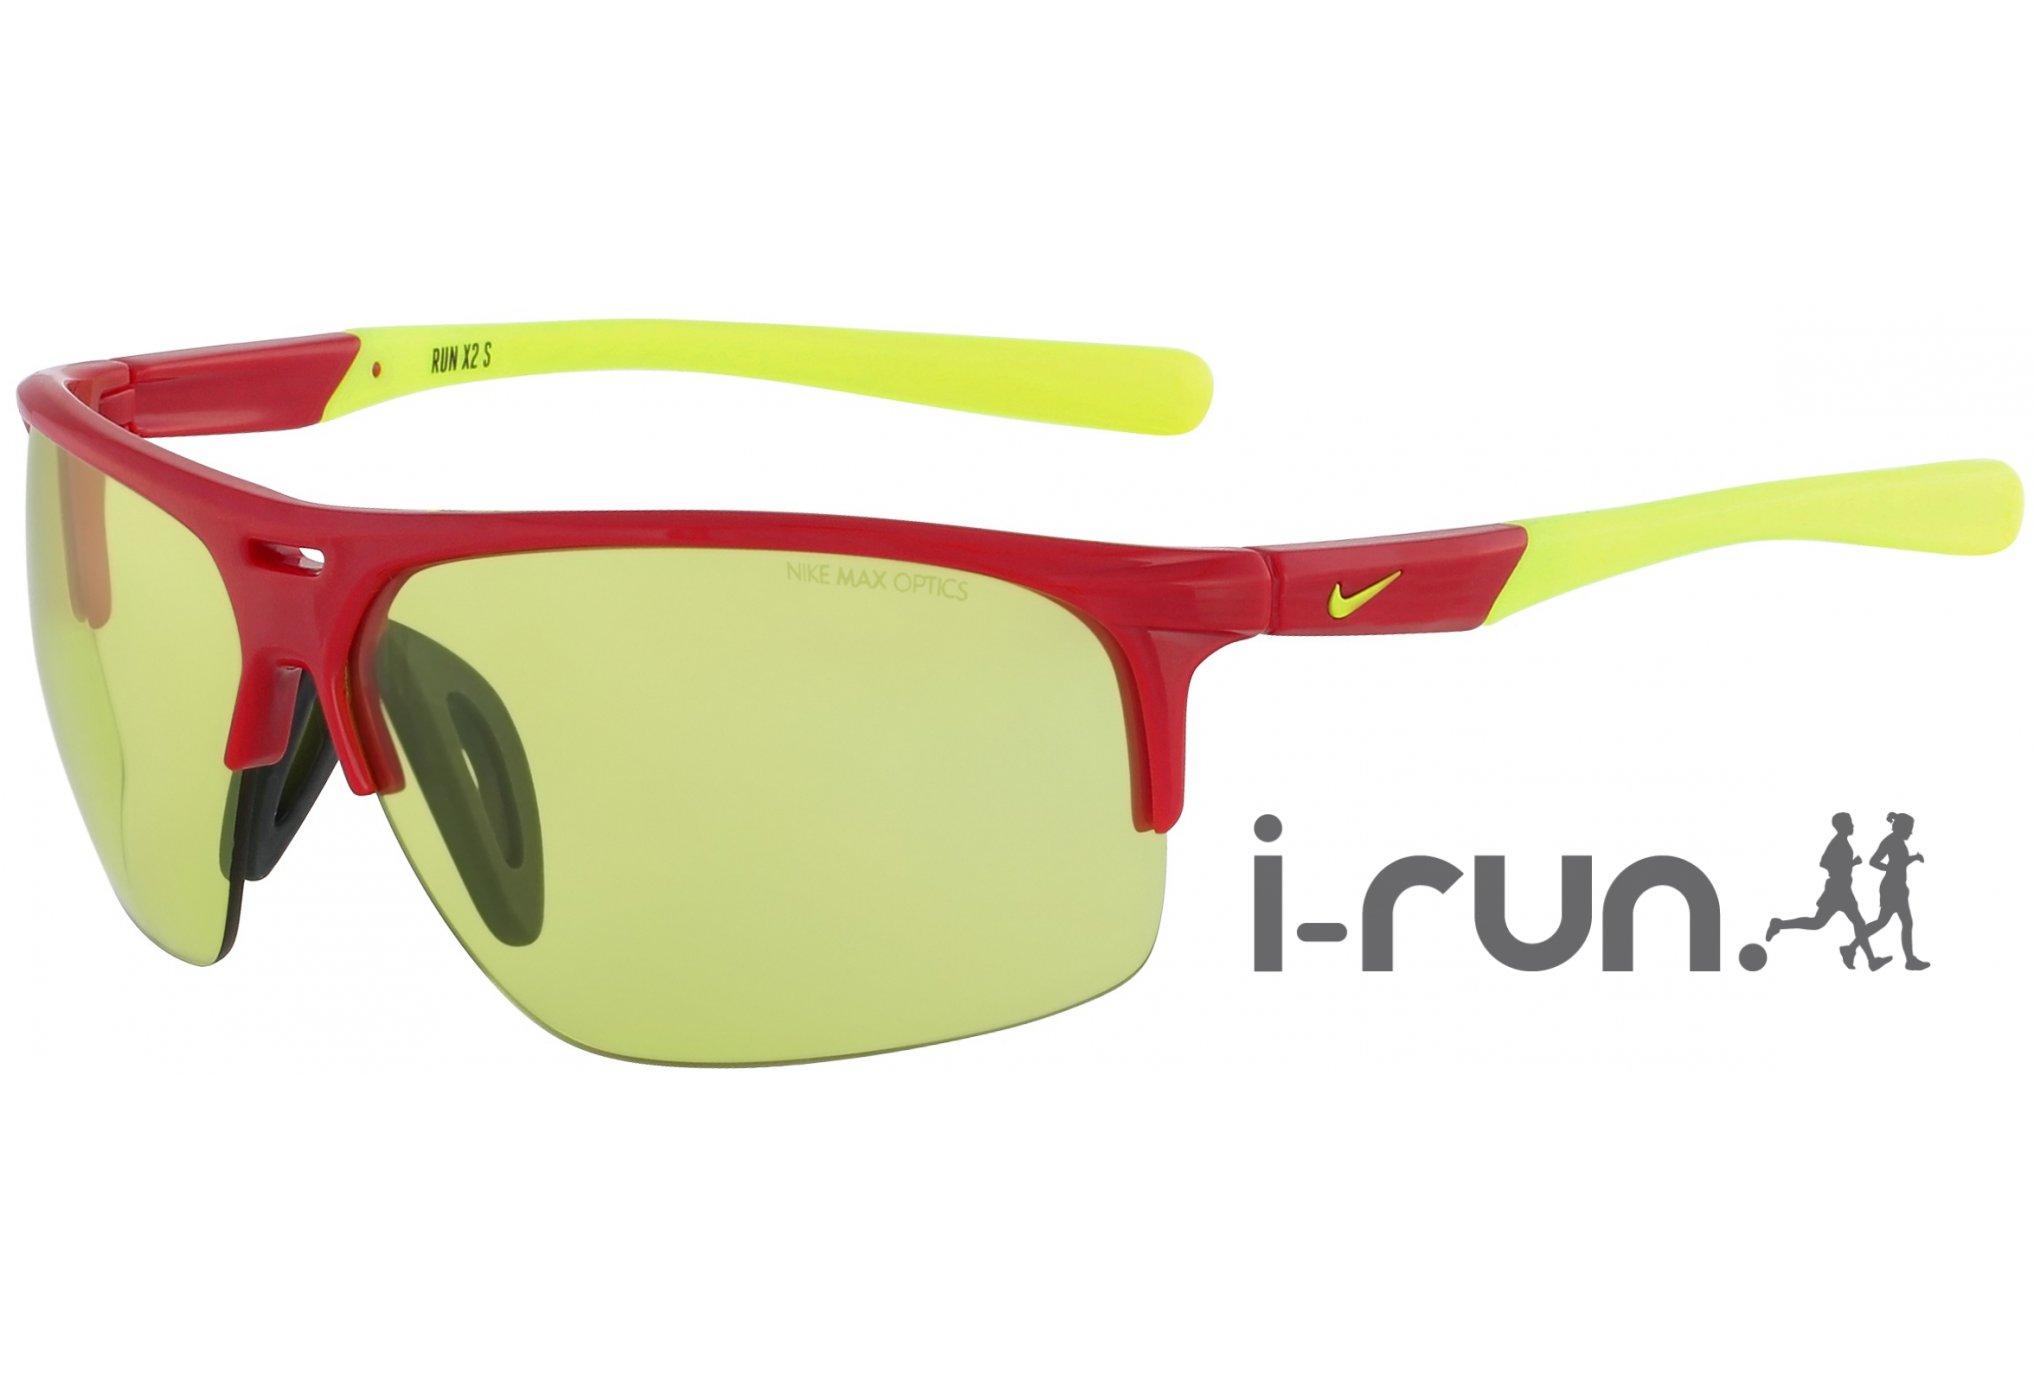 Nike Lunettes Run X2 S R Lunettes